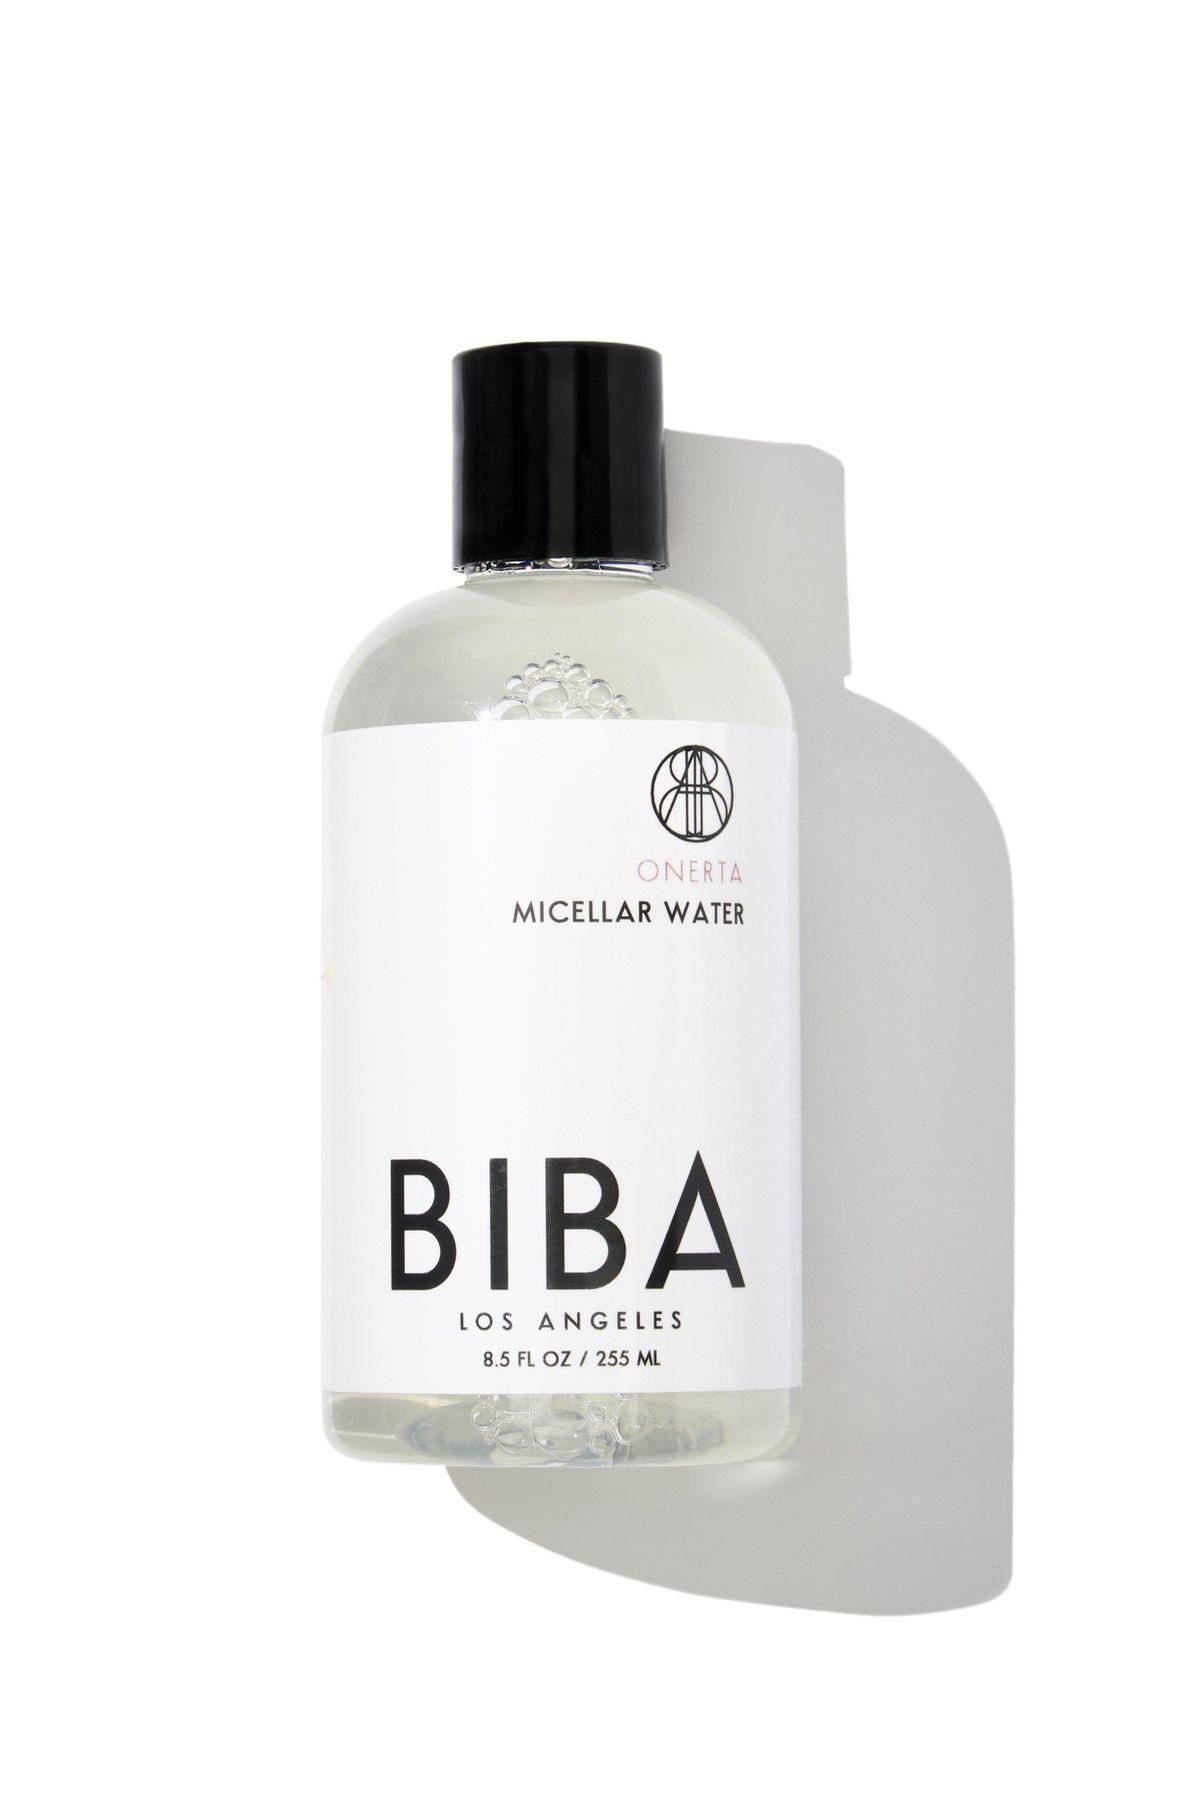 biba micellar water